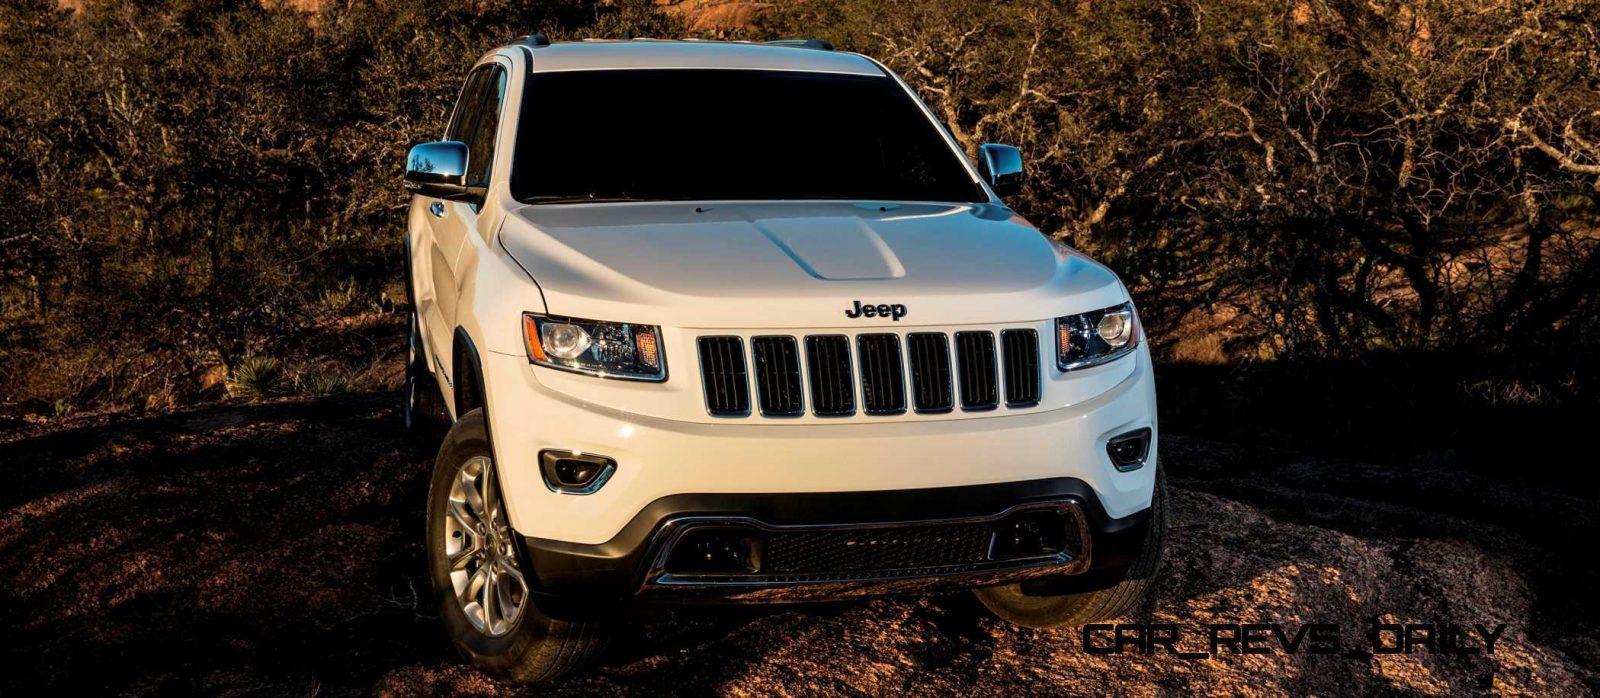 Jeep Cherokee Altitude >> 2014 Jeep Grand Cherokee Laredo from $29,000